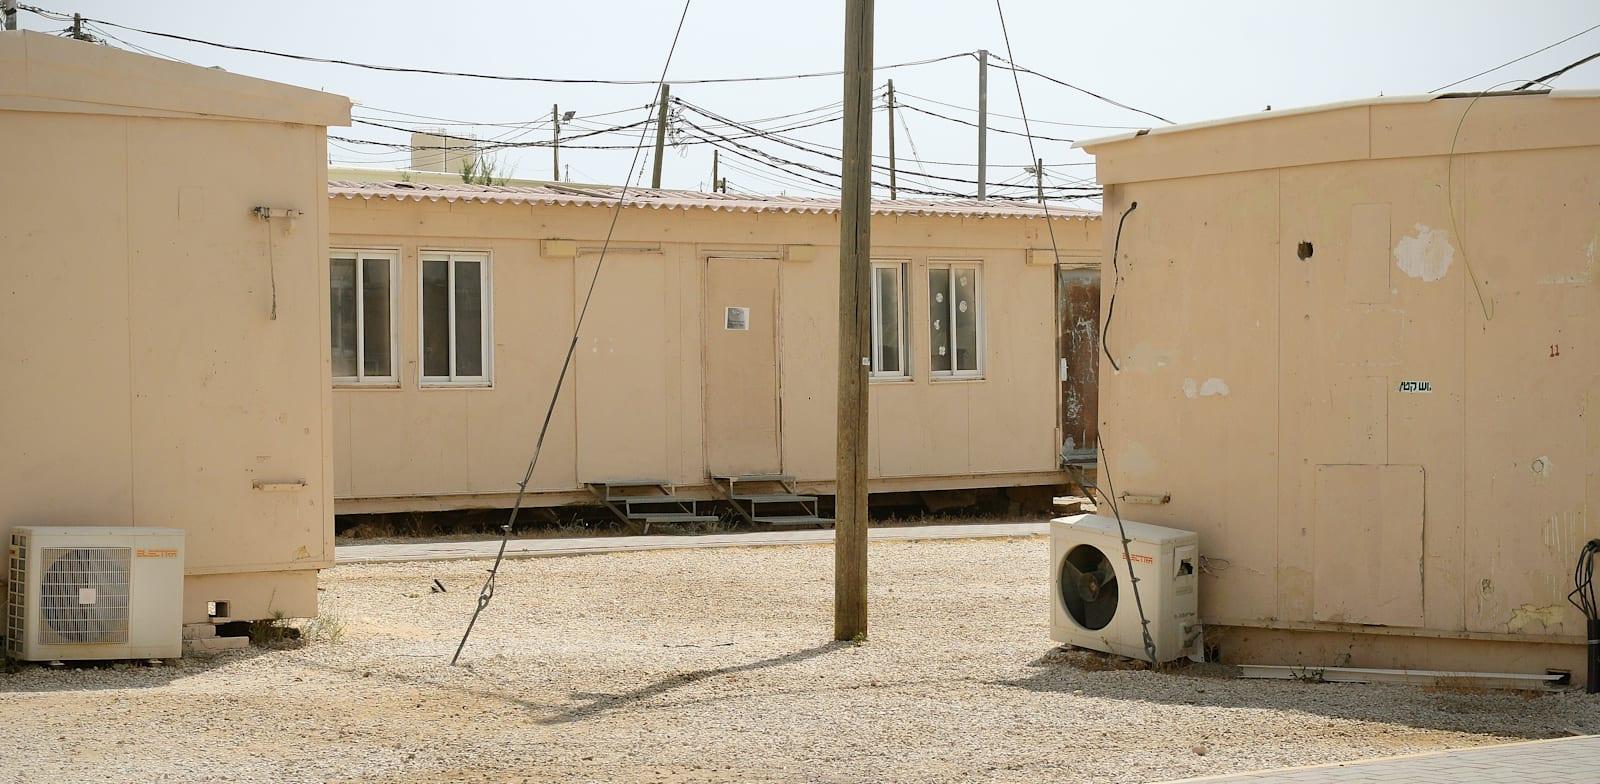 בסיס צבאי, מגורי חיילים בנגב / צילום: איל יצהר